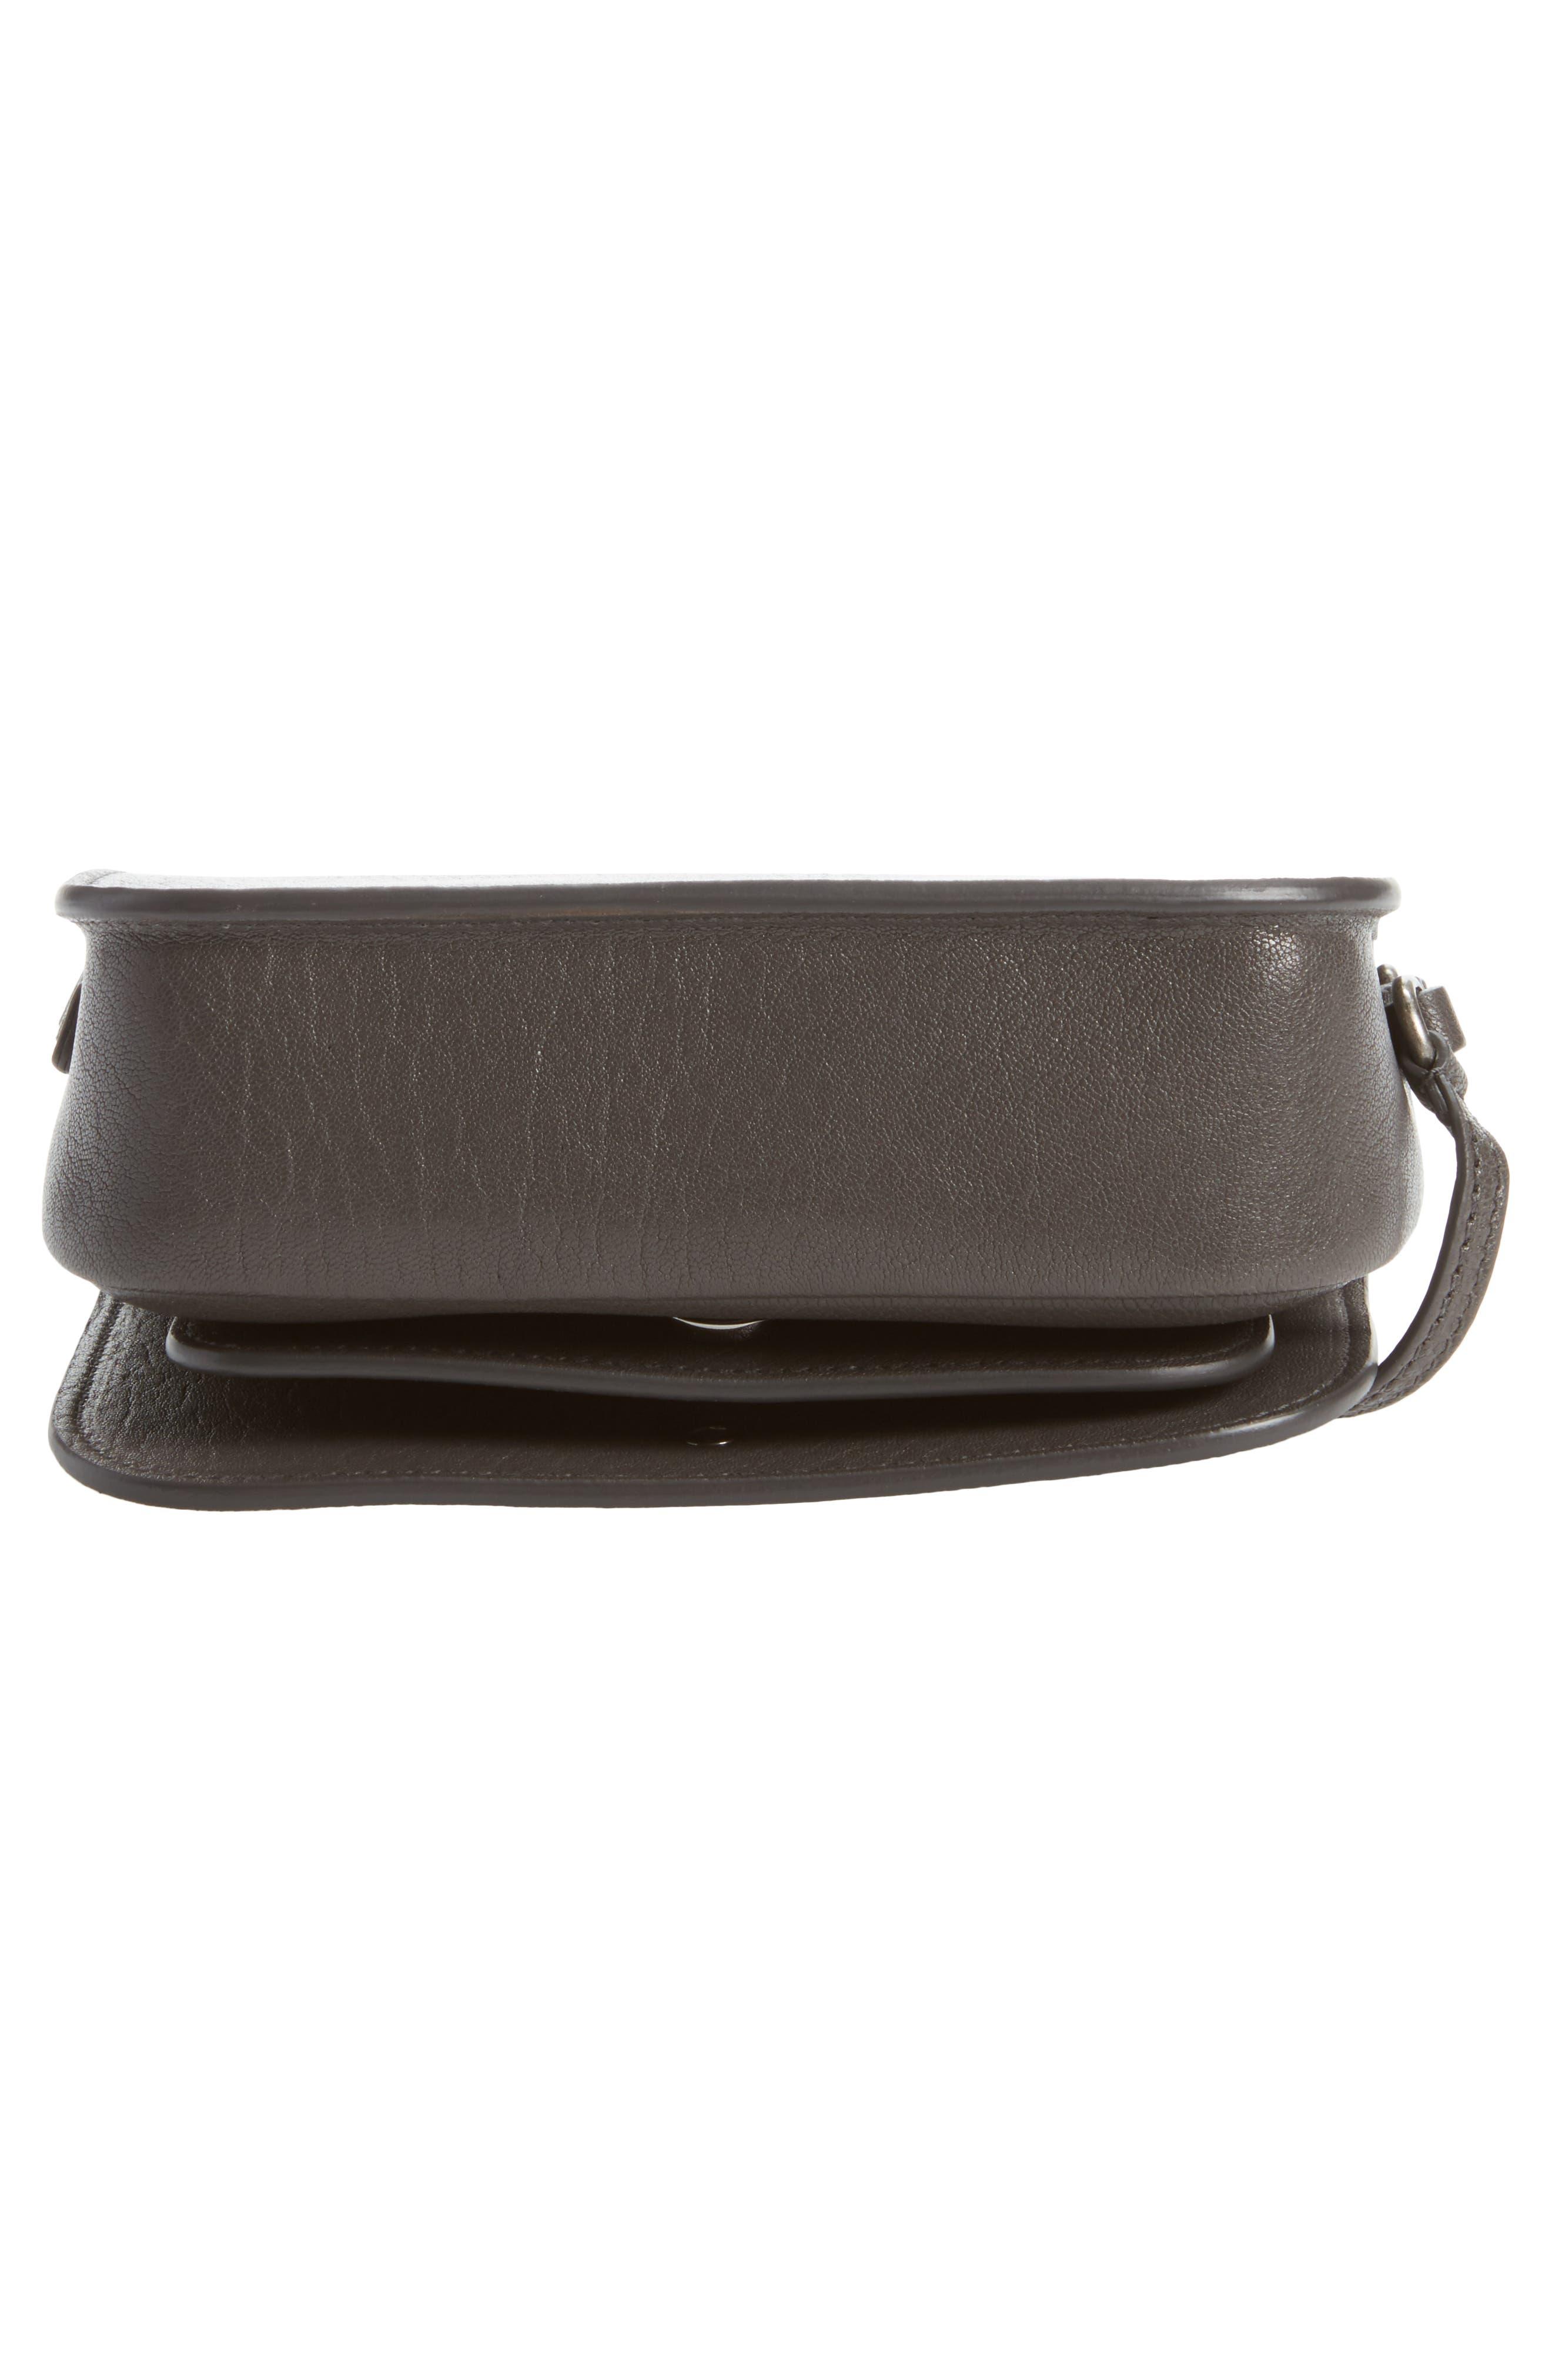 Calfskin Leather Crossbody Bag,                             Alternate thumbnail 6, color,                             Asphalt